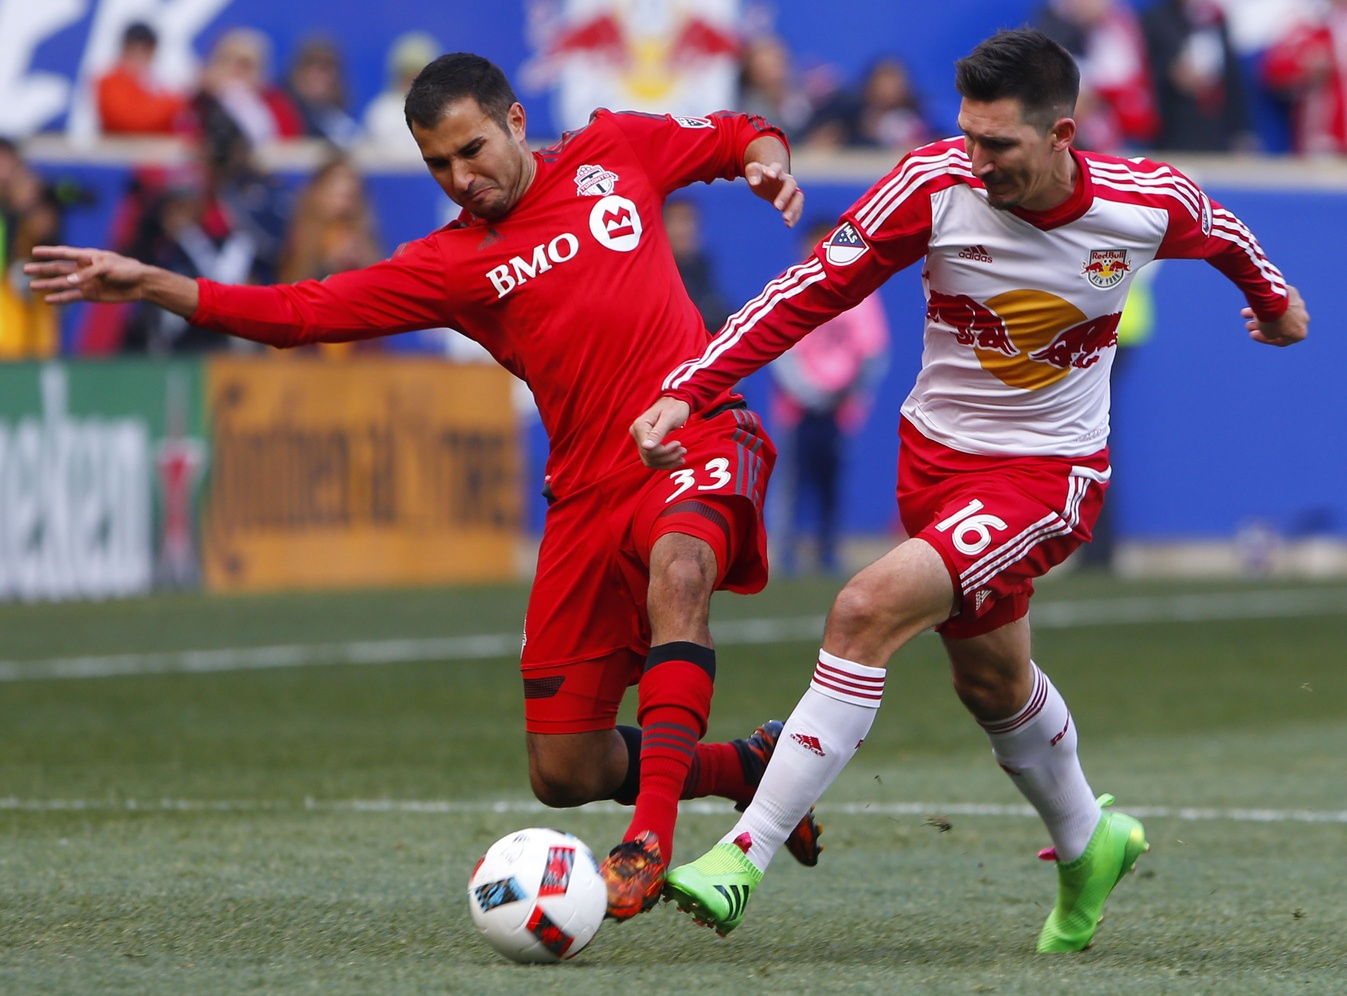 Photo by Noah K. Murray/USA TODAY Sports